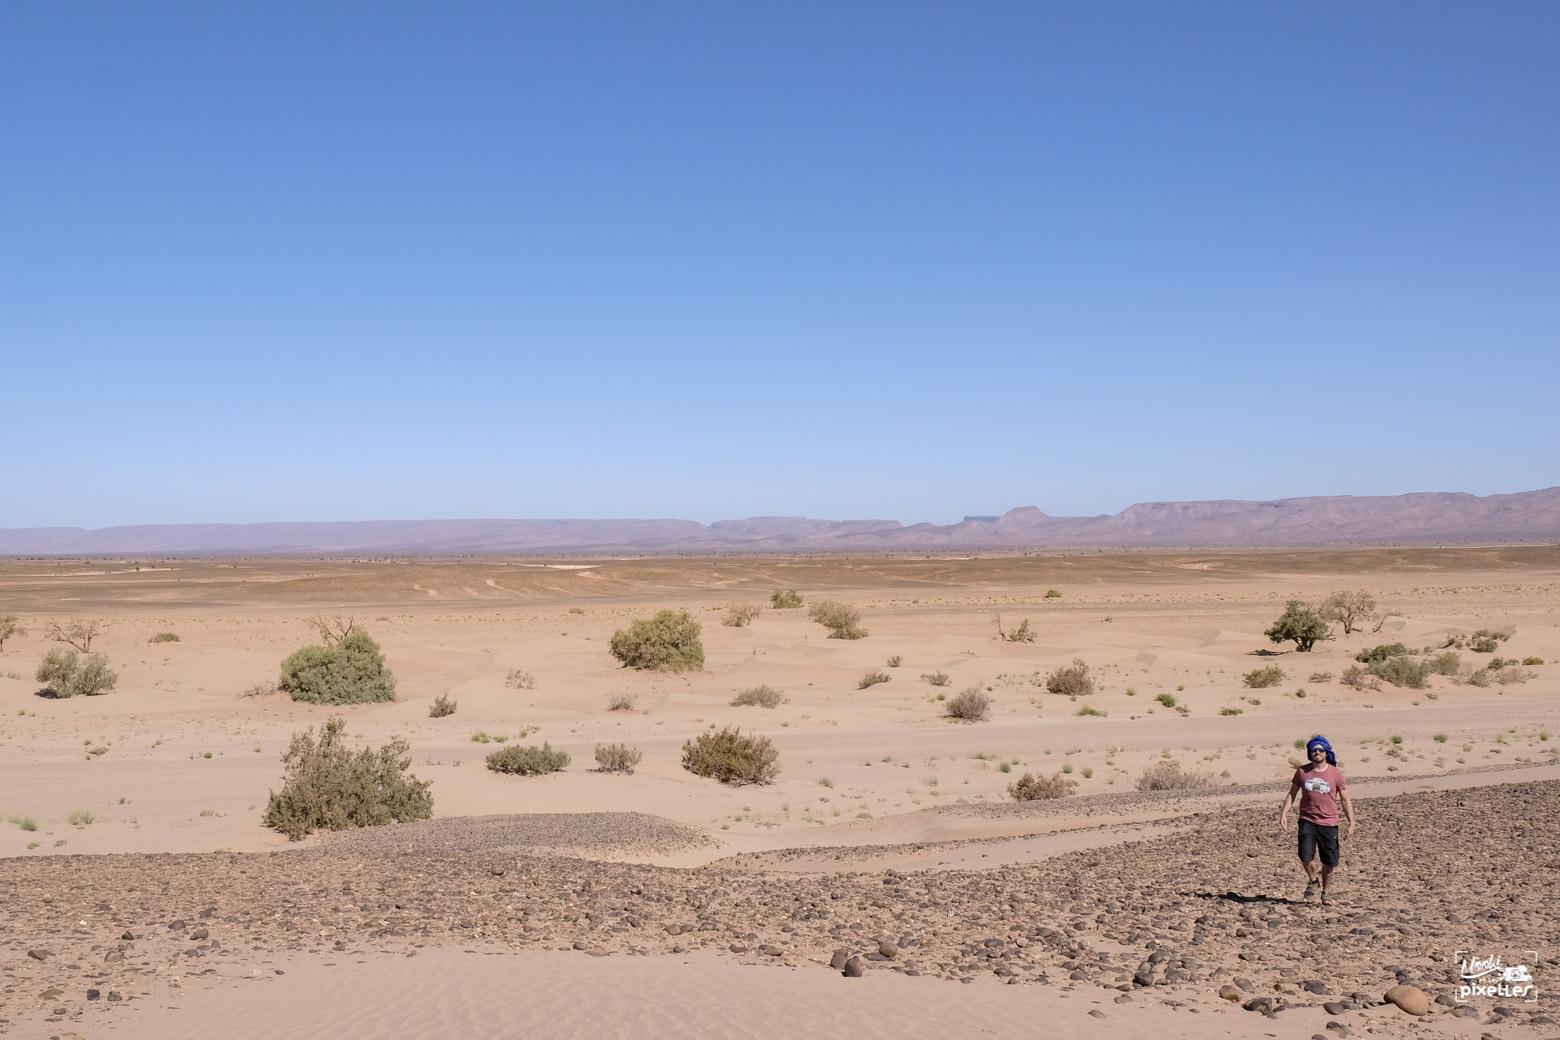 Damien au milieu du hamada au Maroc